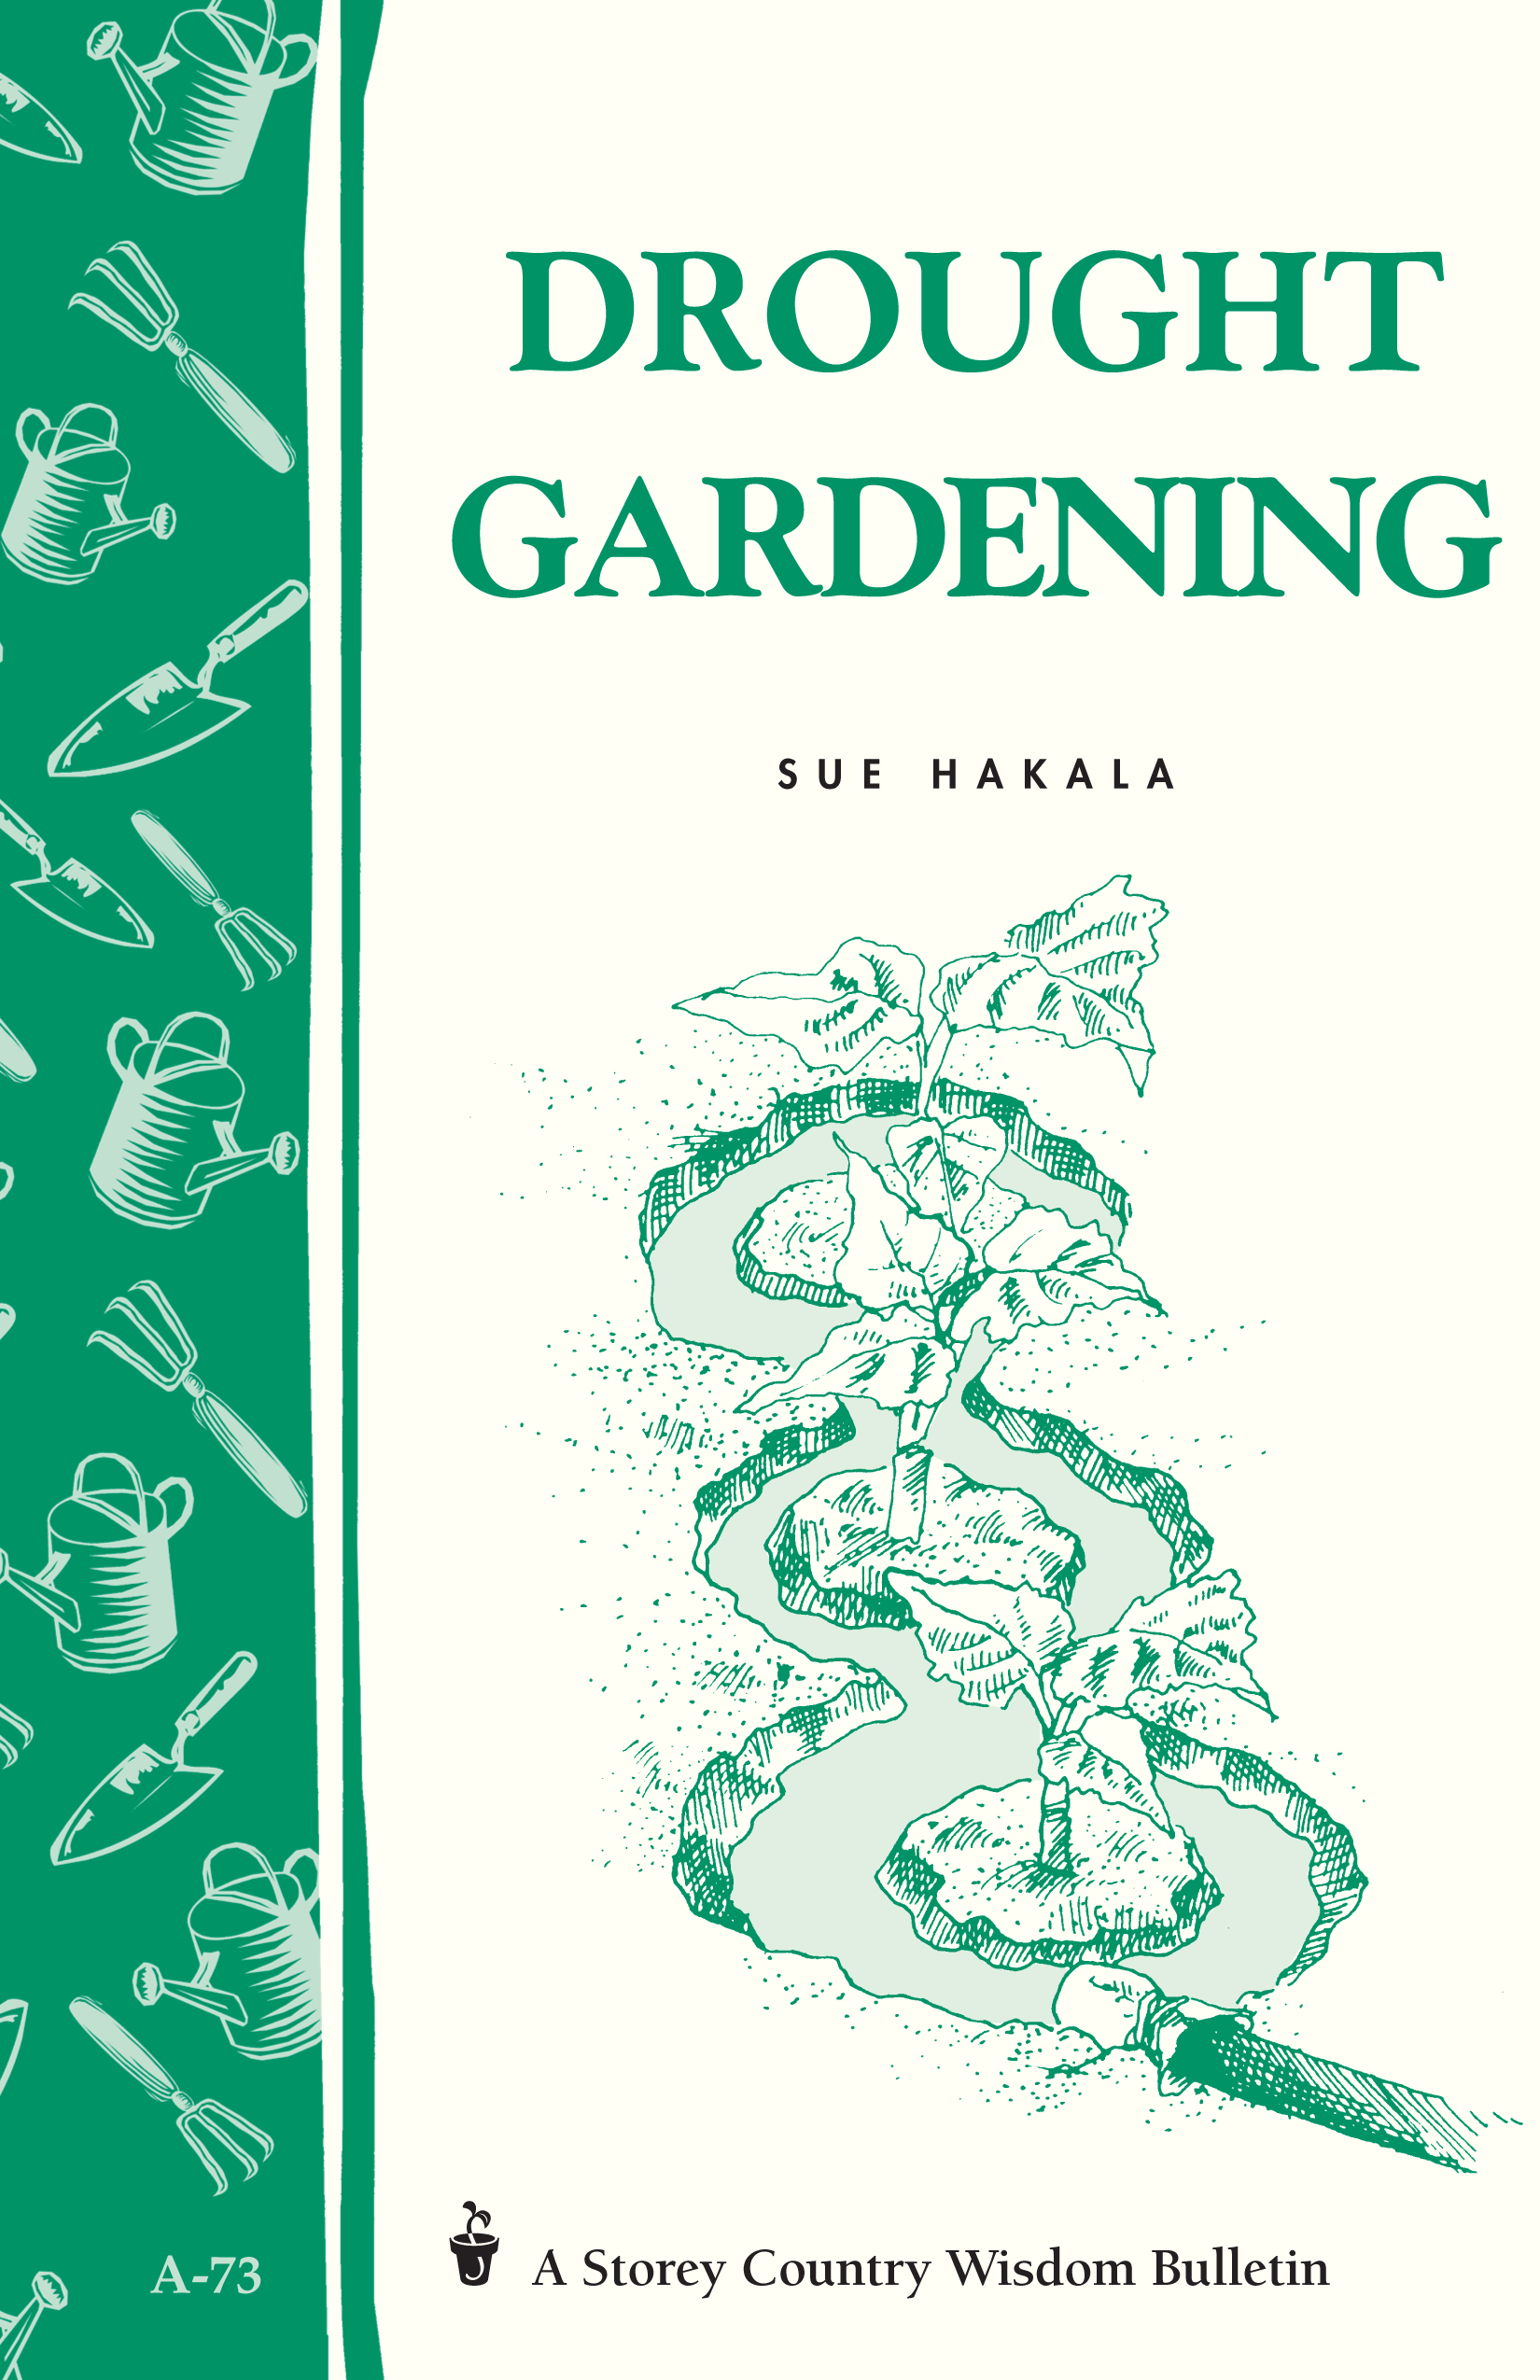 Drought Gardening Storey's Country Wisdom Bulletin A-73 - Sue Hakala